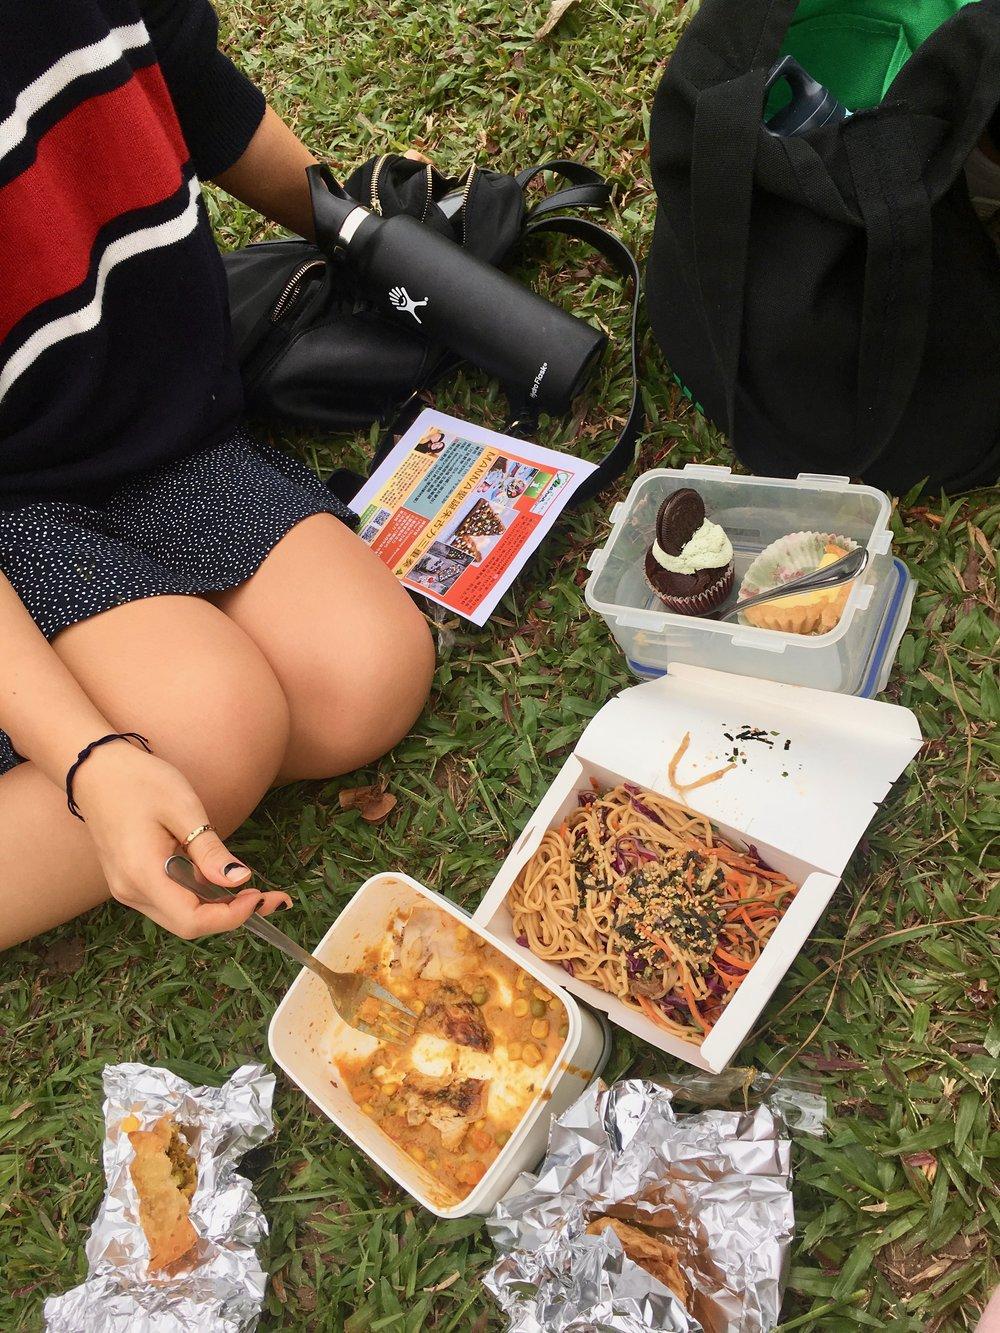 Samosas, naan and curry from Khana Khazana, and noodles from Loving Hut